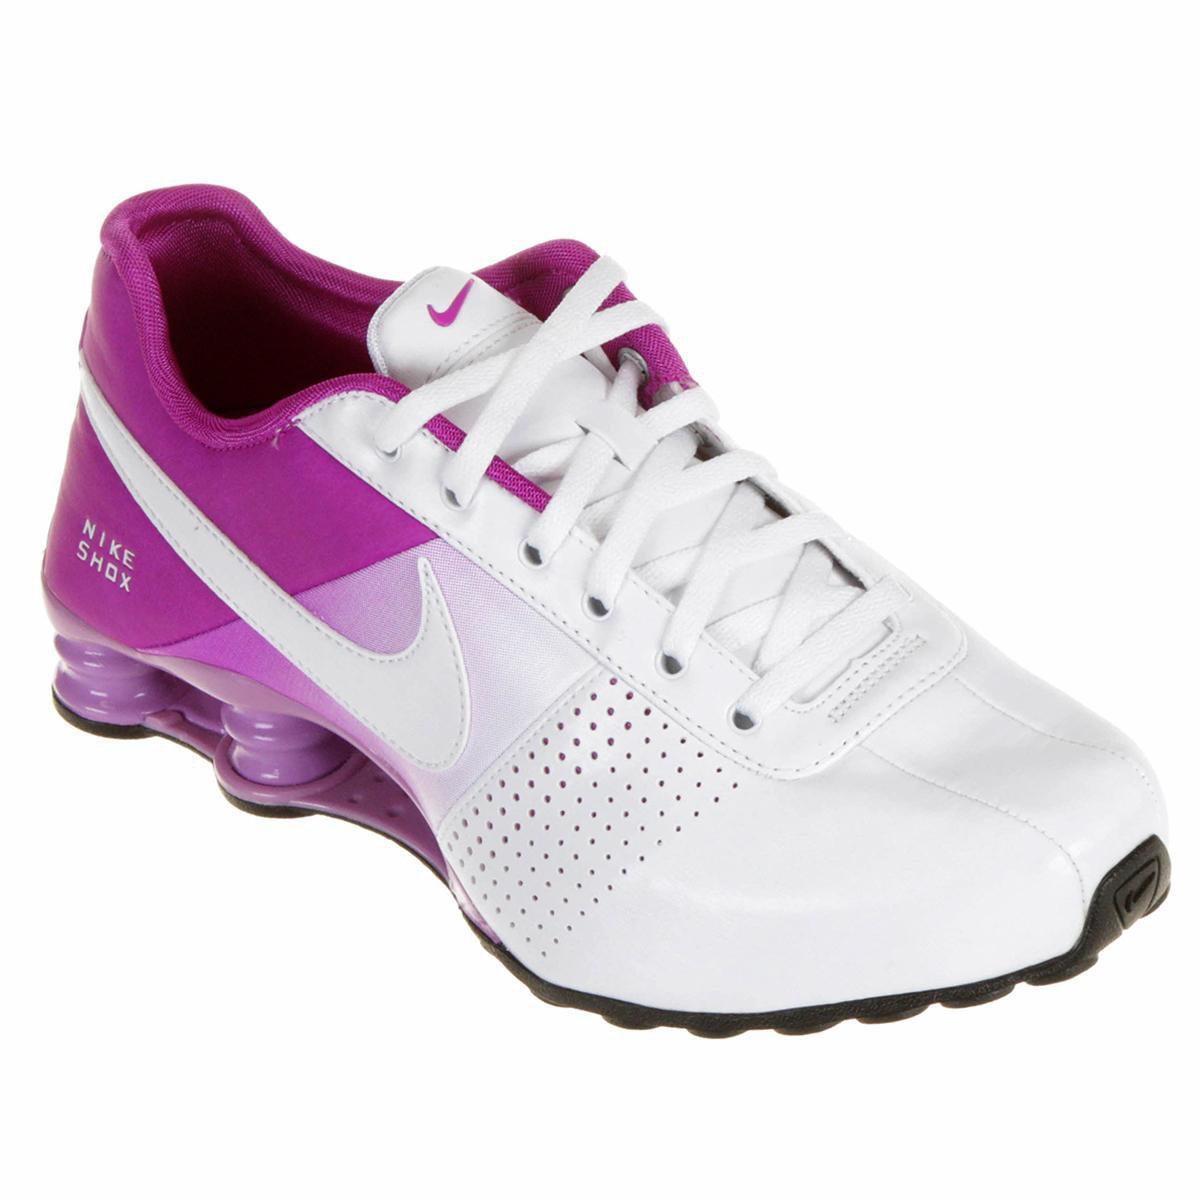 8914f6f6cc0 Tênis Nike Shox Deliver .